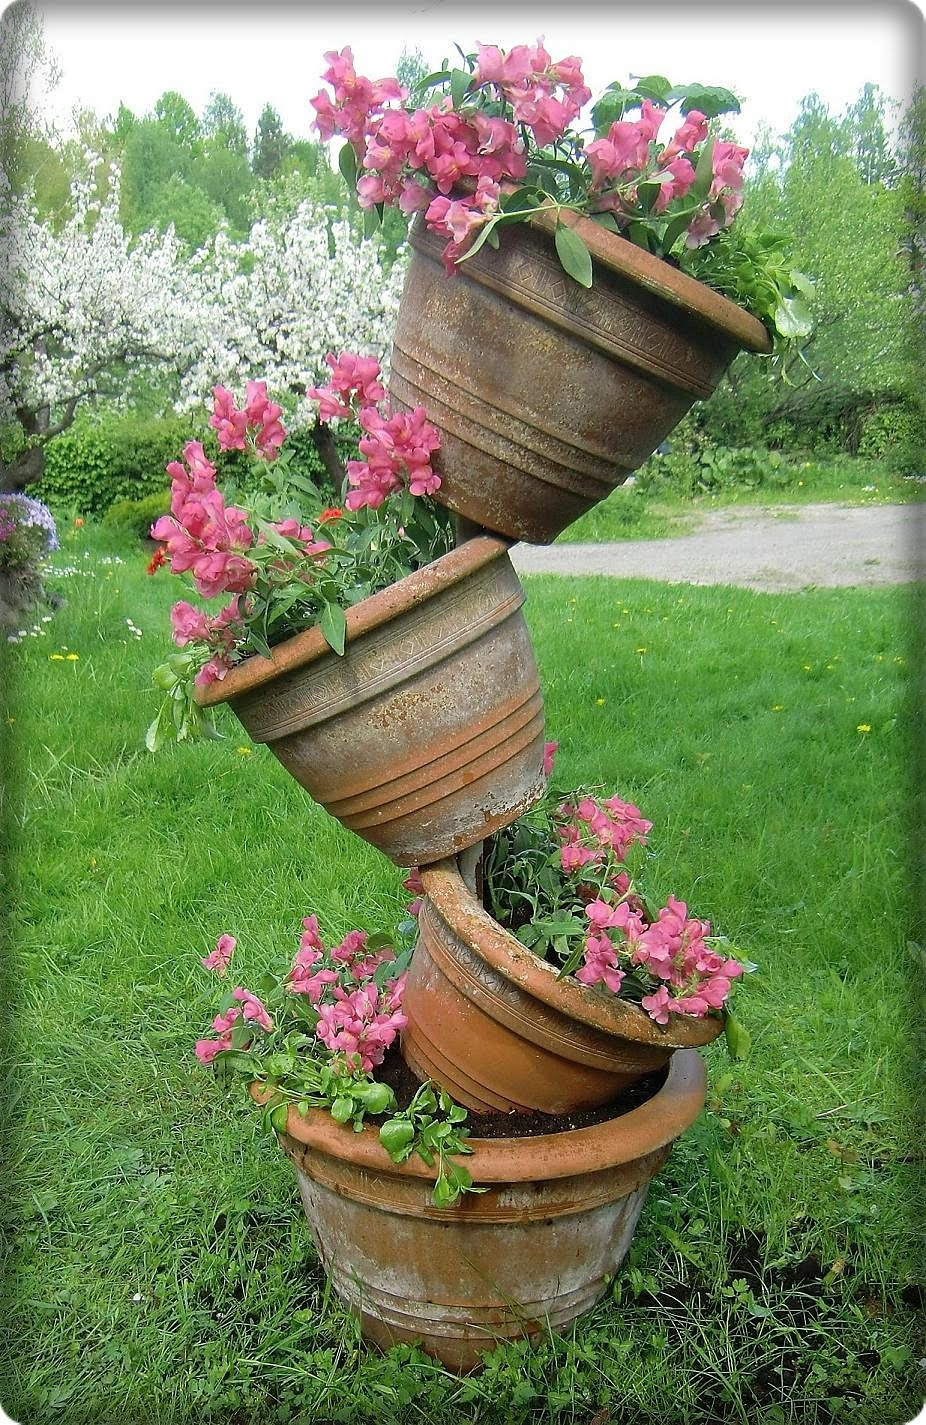 Blomster: Min Tipsy pot har fått blommor!